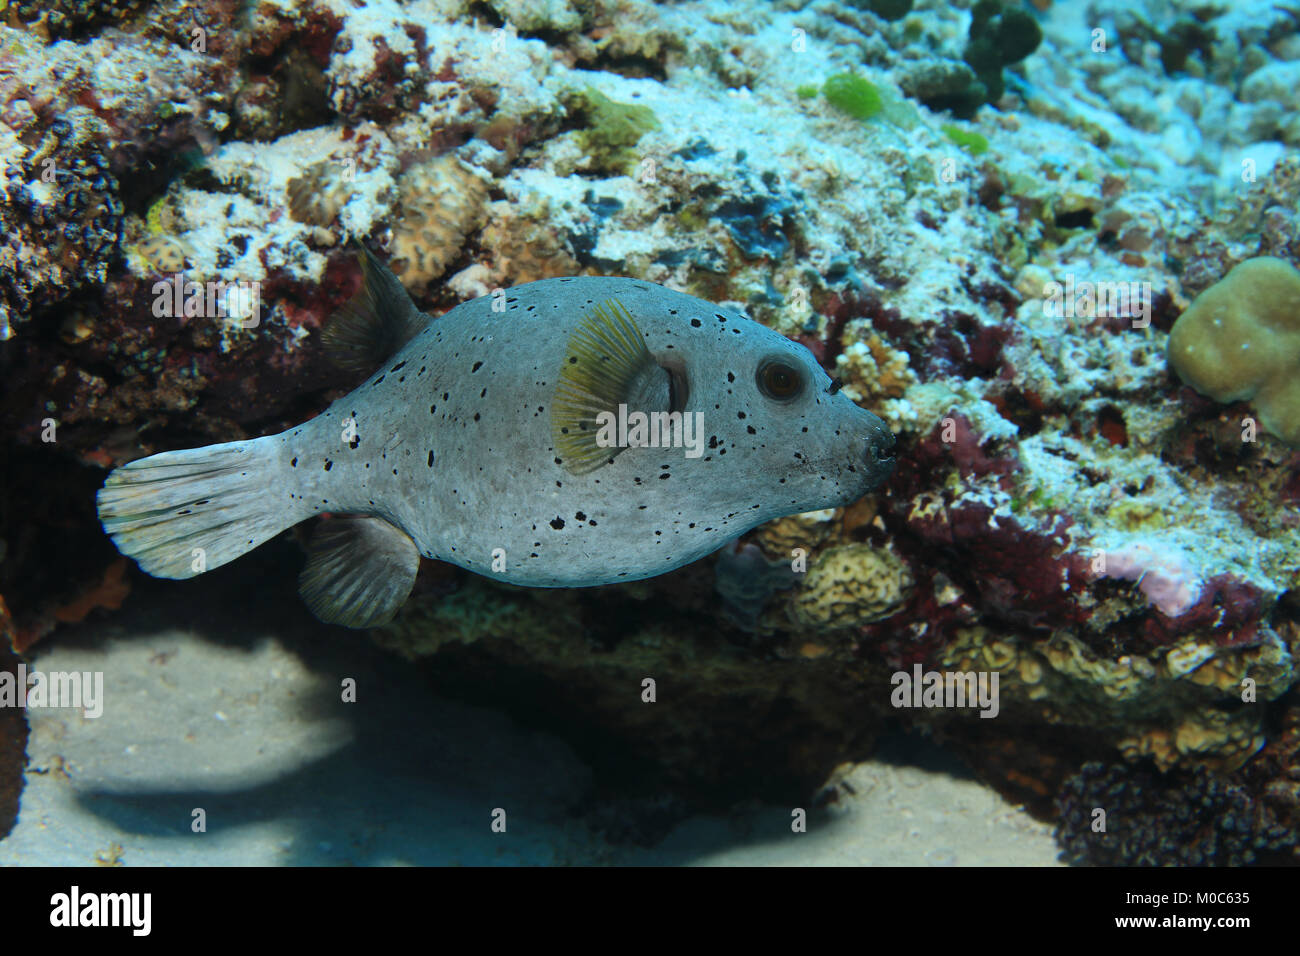 Blackspotted pufferfish (Arothron nigropunctatus) underwater in the tropical coral reef - Stock Image